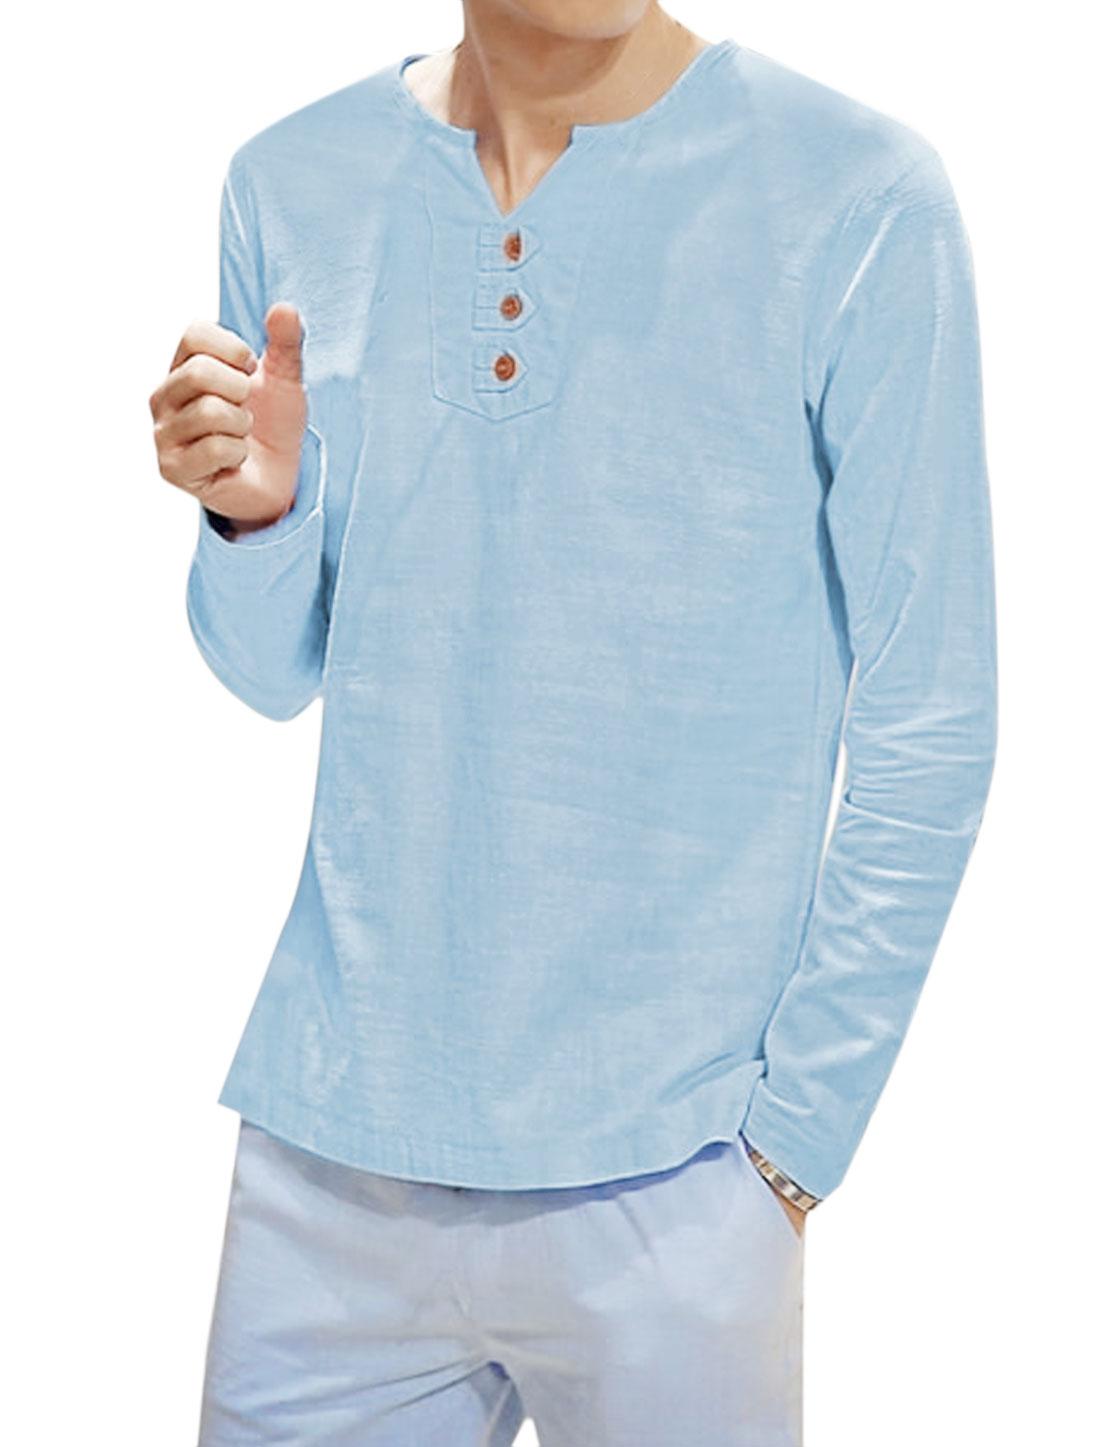 Men Long Sleeves Buttons Embellished T-Shirt Light Blue S